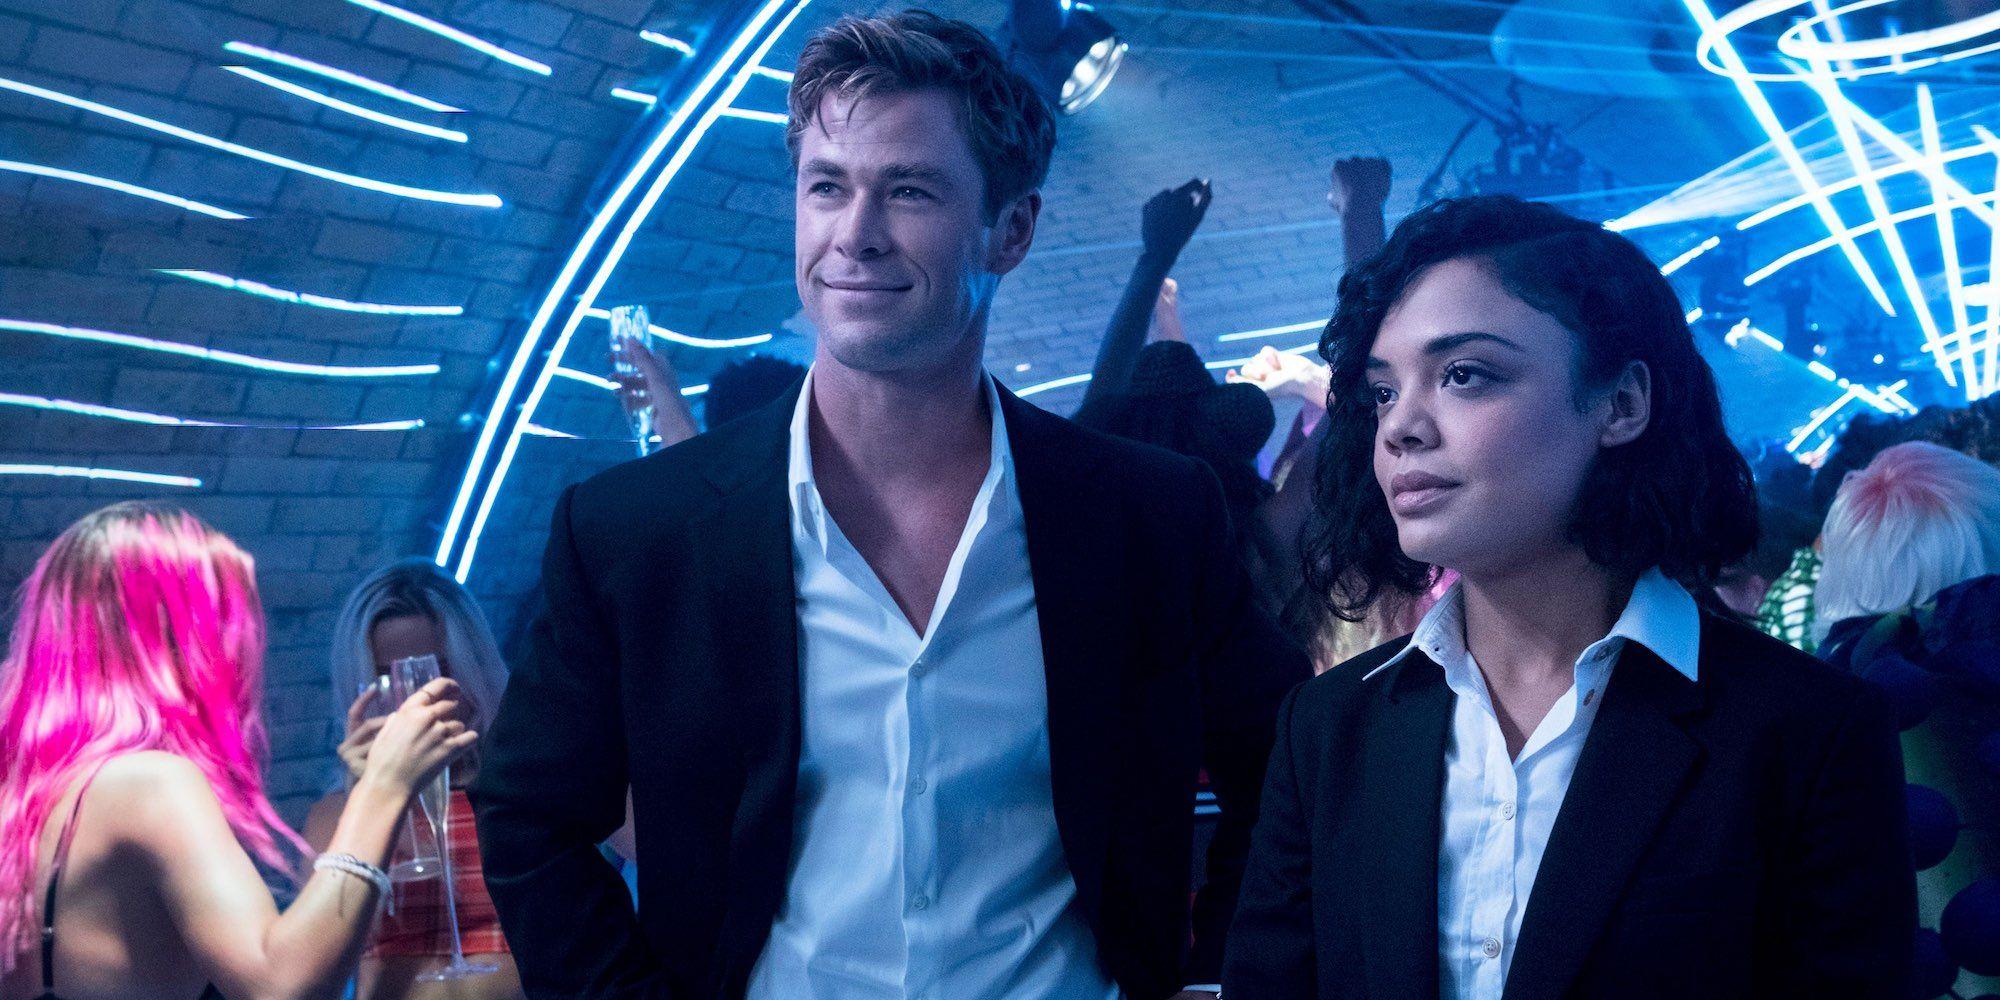 Men In Black International Gets Franchise Low Rotten Tomatoes Score